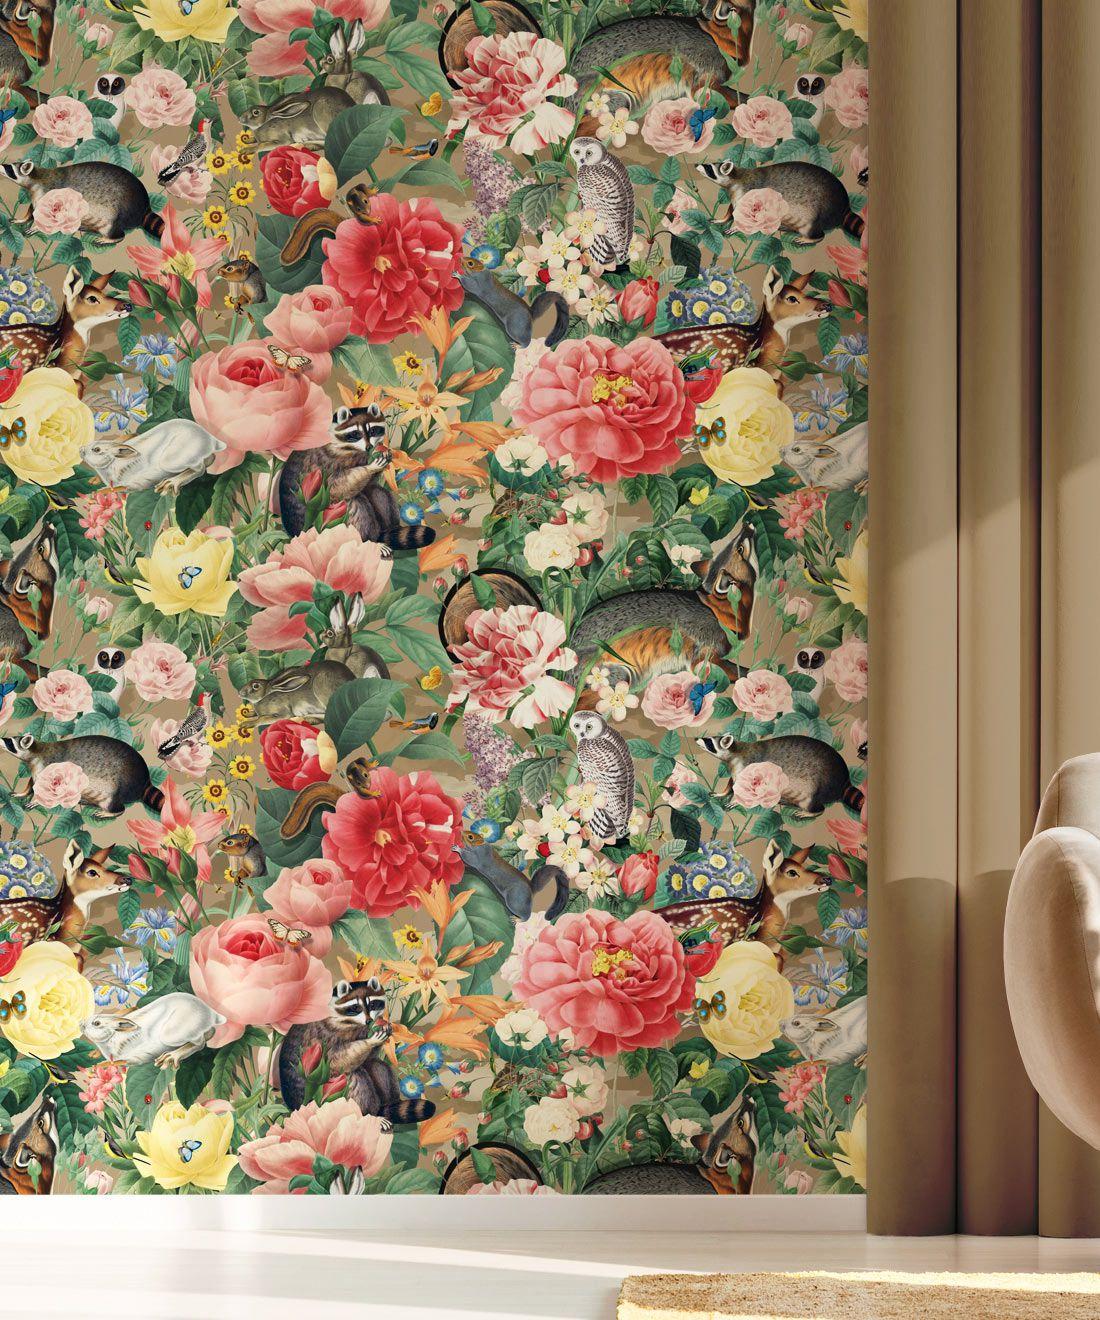 Bush Bouquet Spring Wallpaper • Brown Oak Colored Wallpaper • Assorted Color and Multi-color wallpaper • Floral Wallpaper • Wallpaper With Forest Animals • Insitu